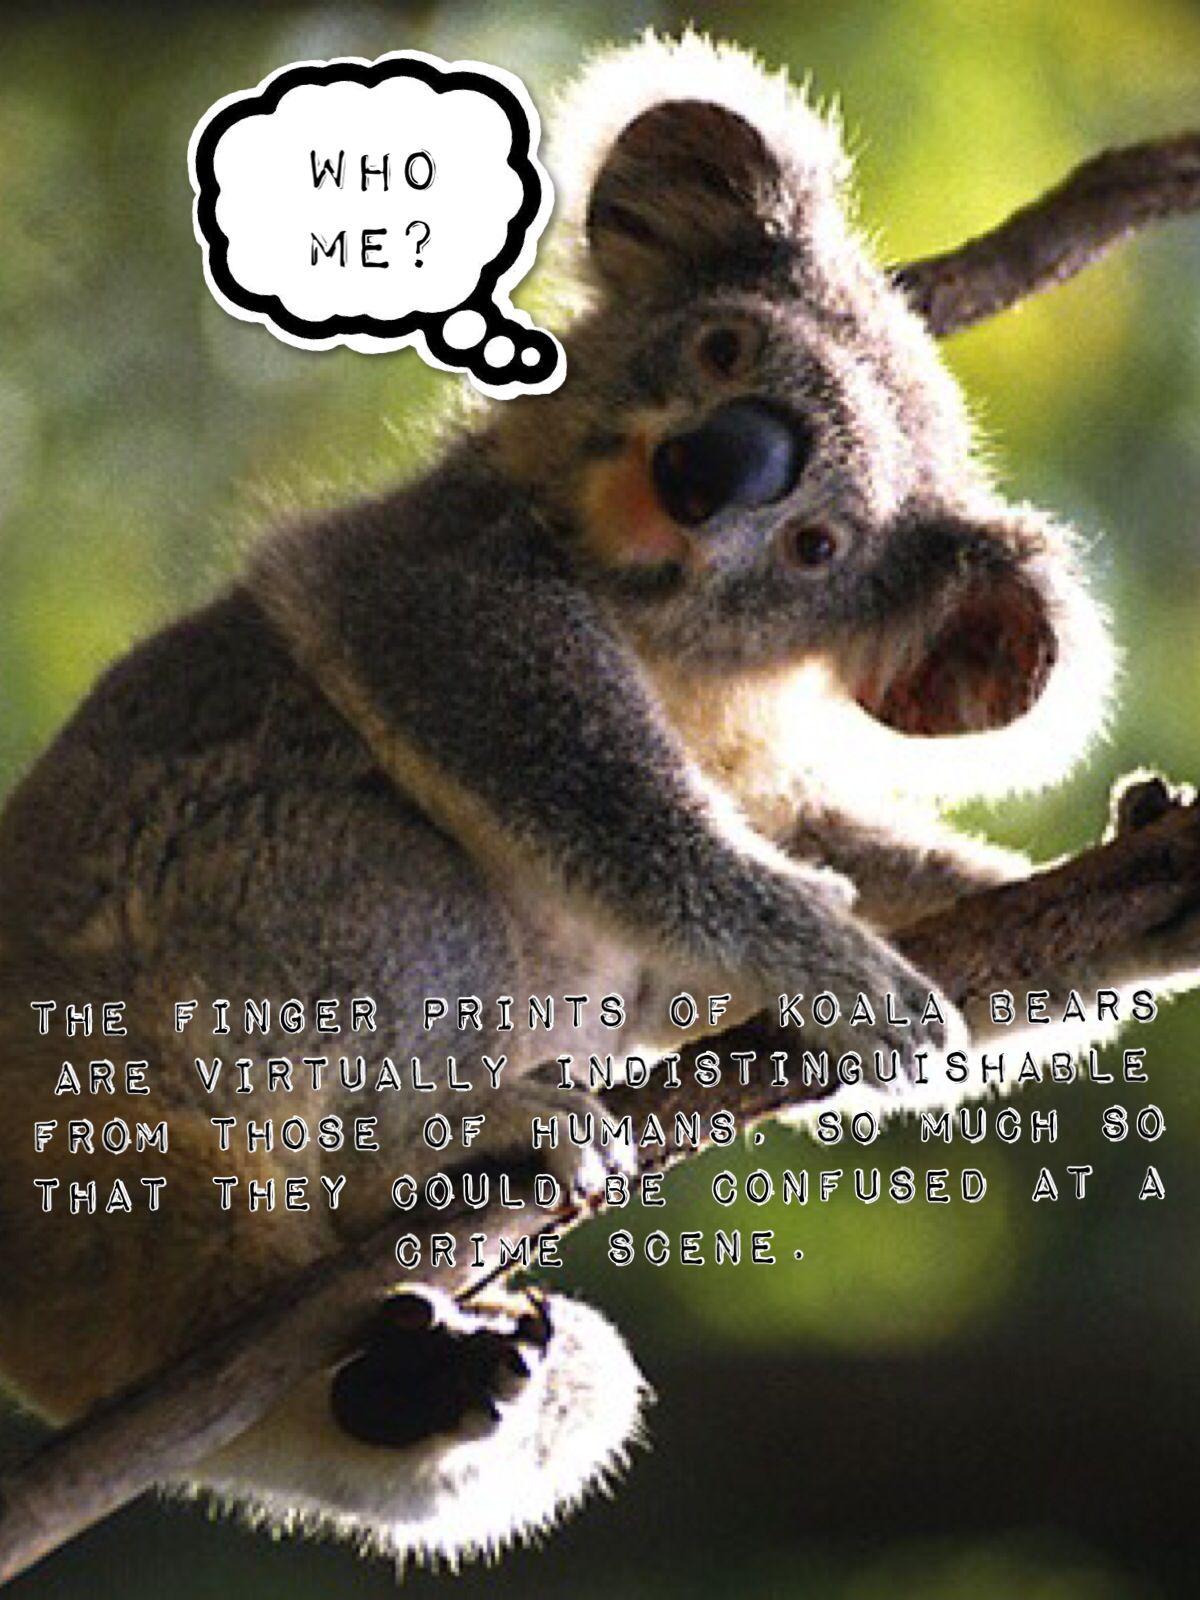 CollegeBound's Fun Fact of the Day. The fingerprints of koala ...